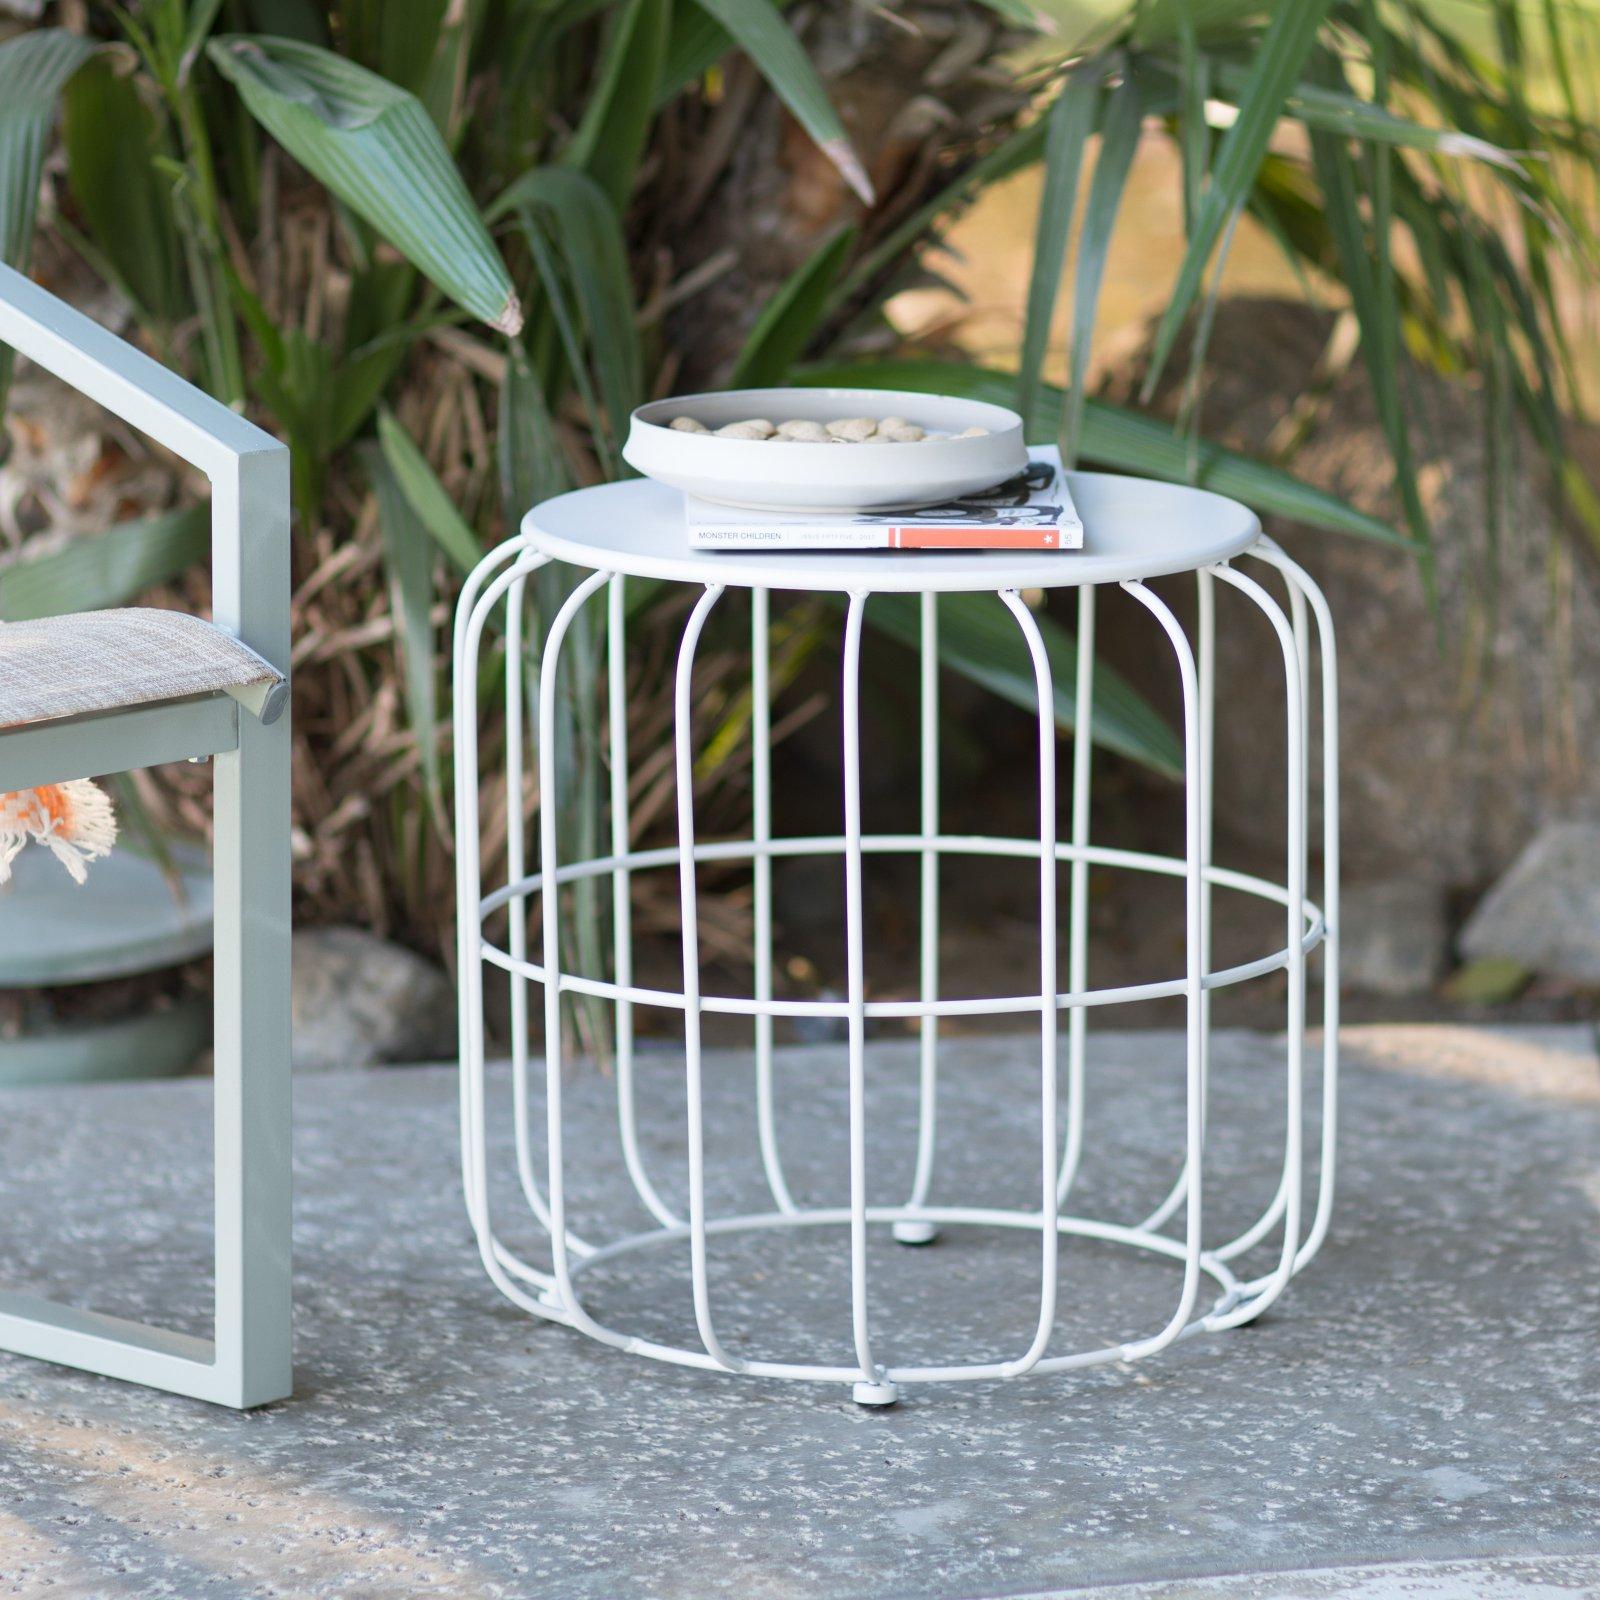 Coral Coast Abbeston Steel Wire Patio Side Table by Shenzhen Sunwell Industrial Co Ltd